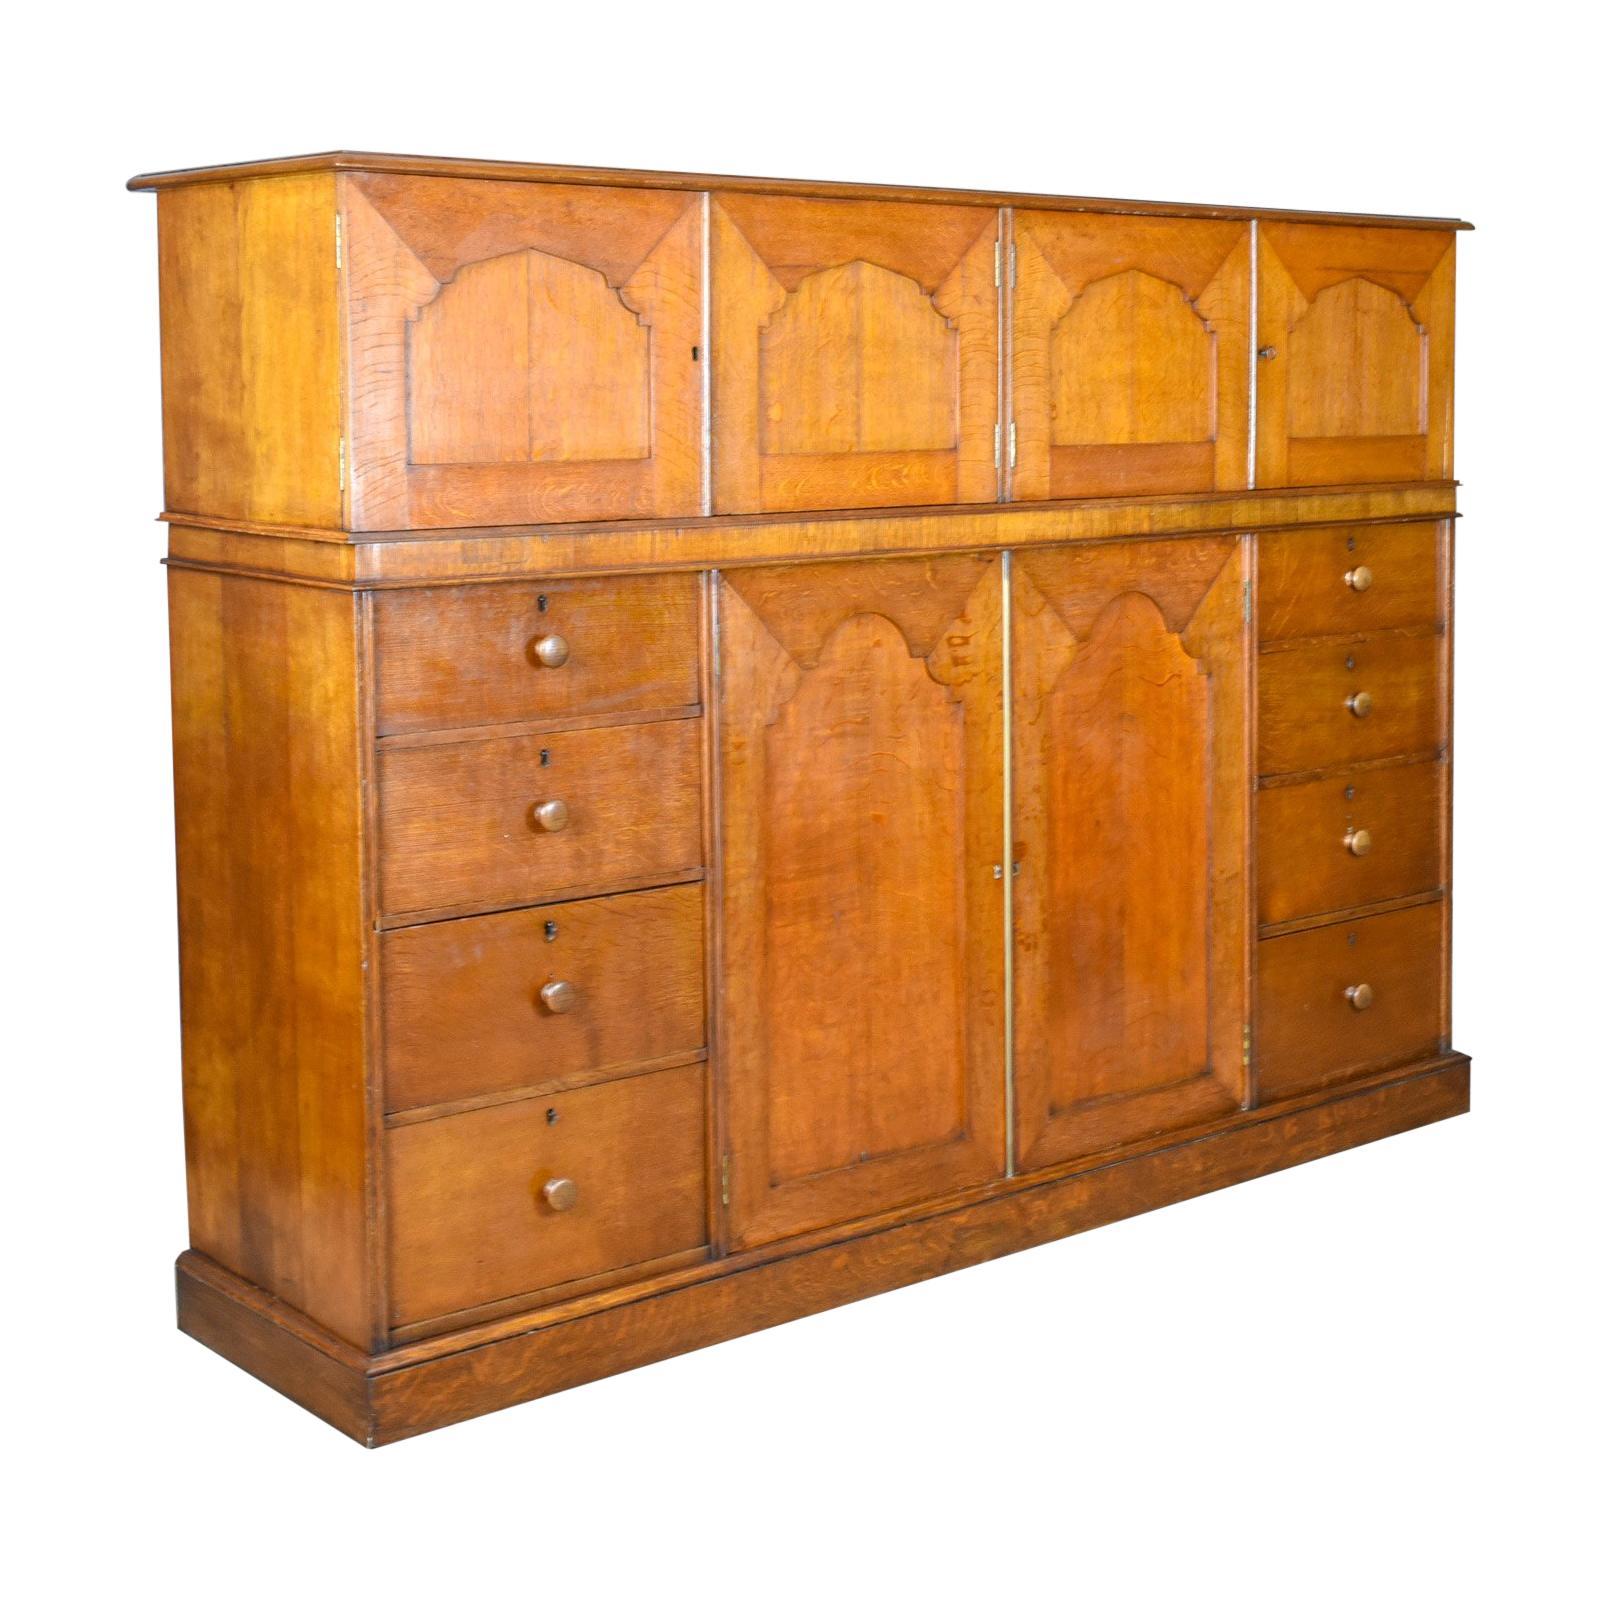 Large Antique Estate Manageru0027s Cupboard, Oak, English Victorian Cabinet